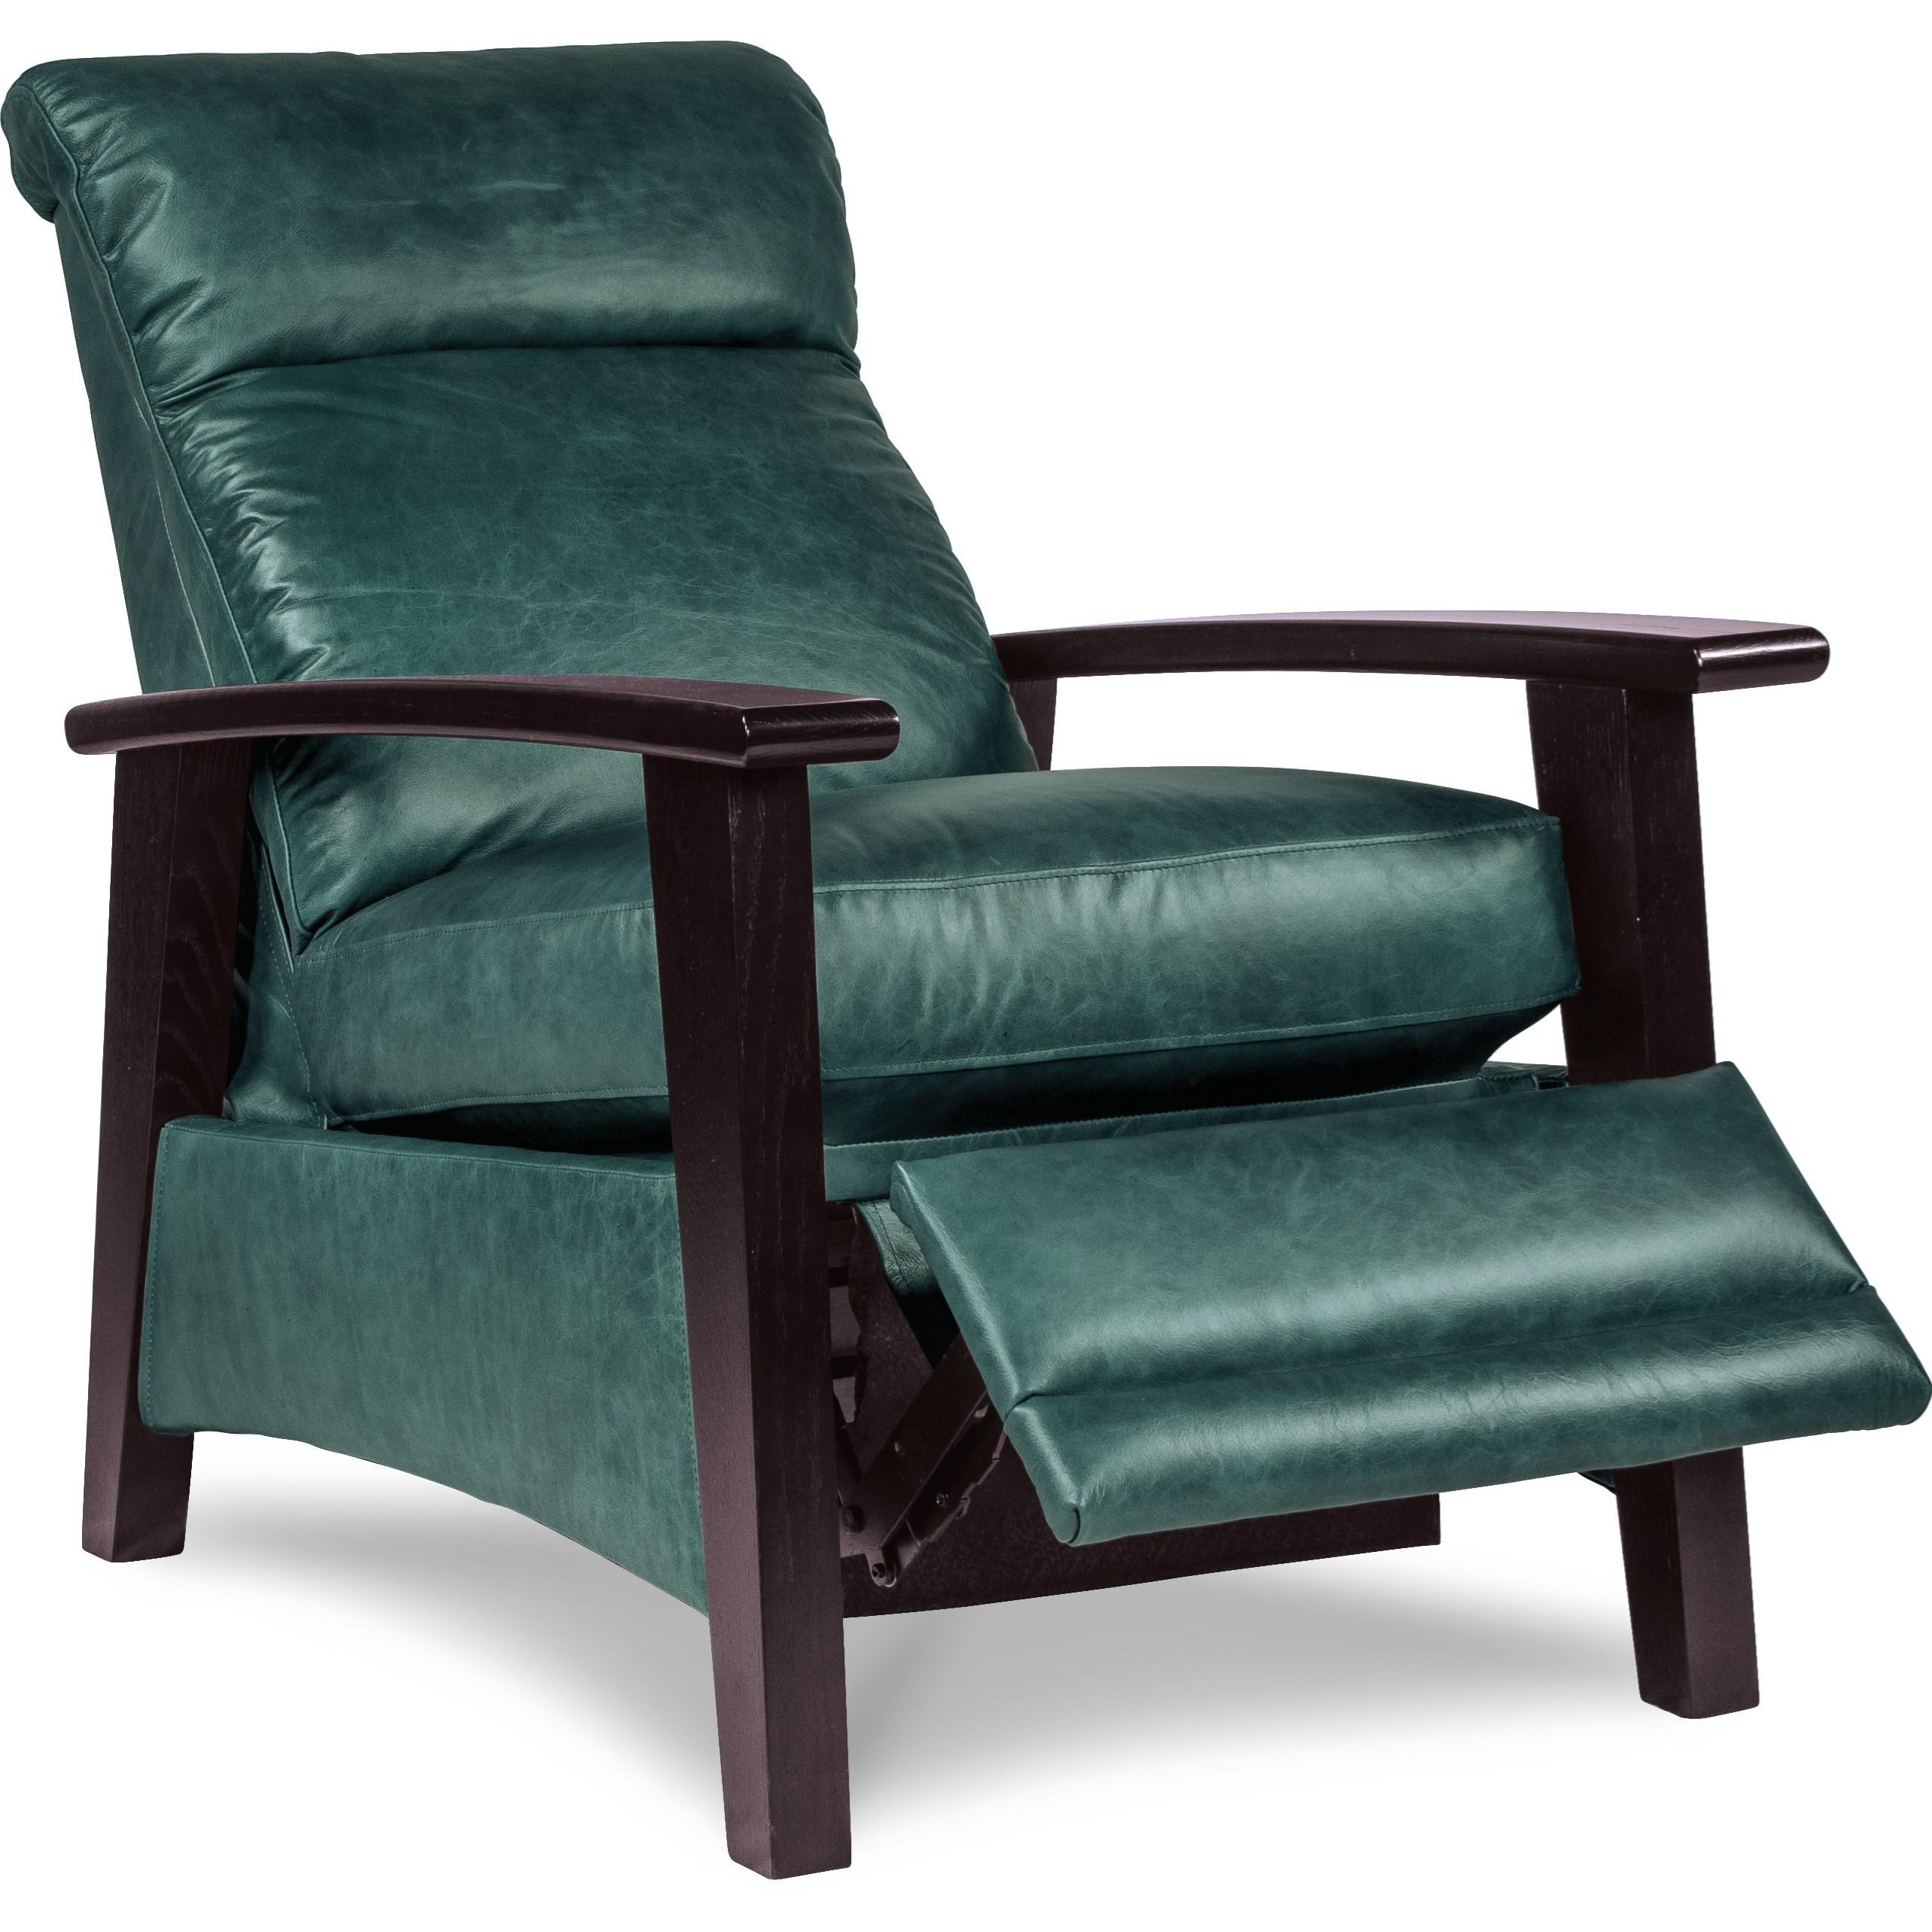 La z boy recliners nouveau modern recliner with wood arms